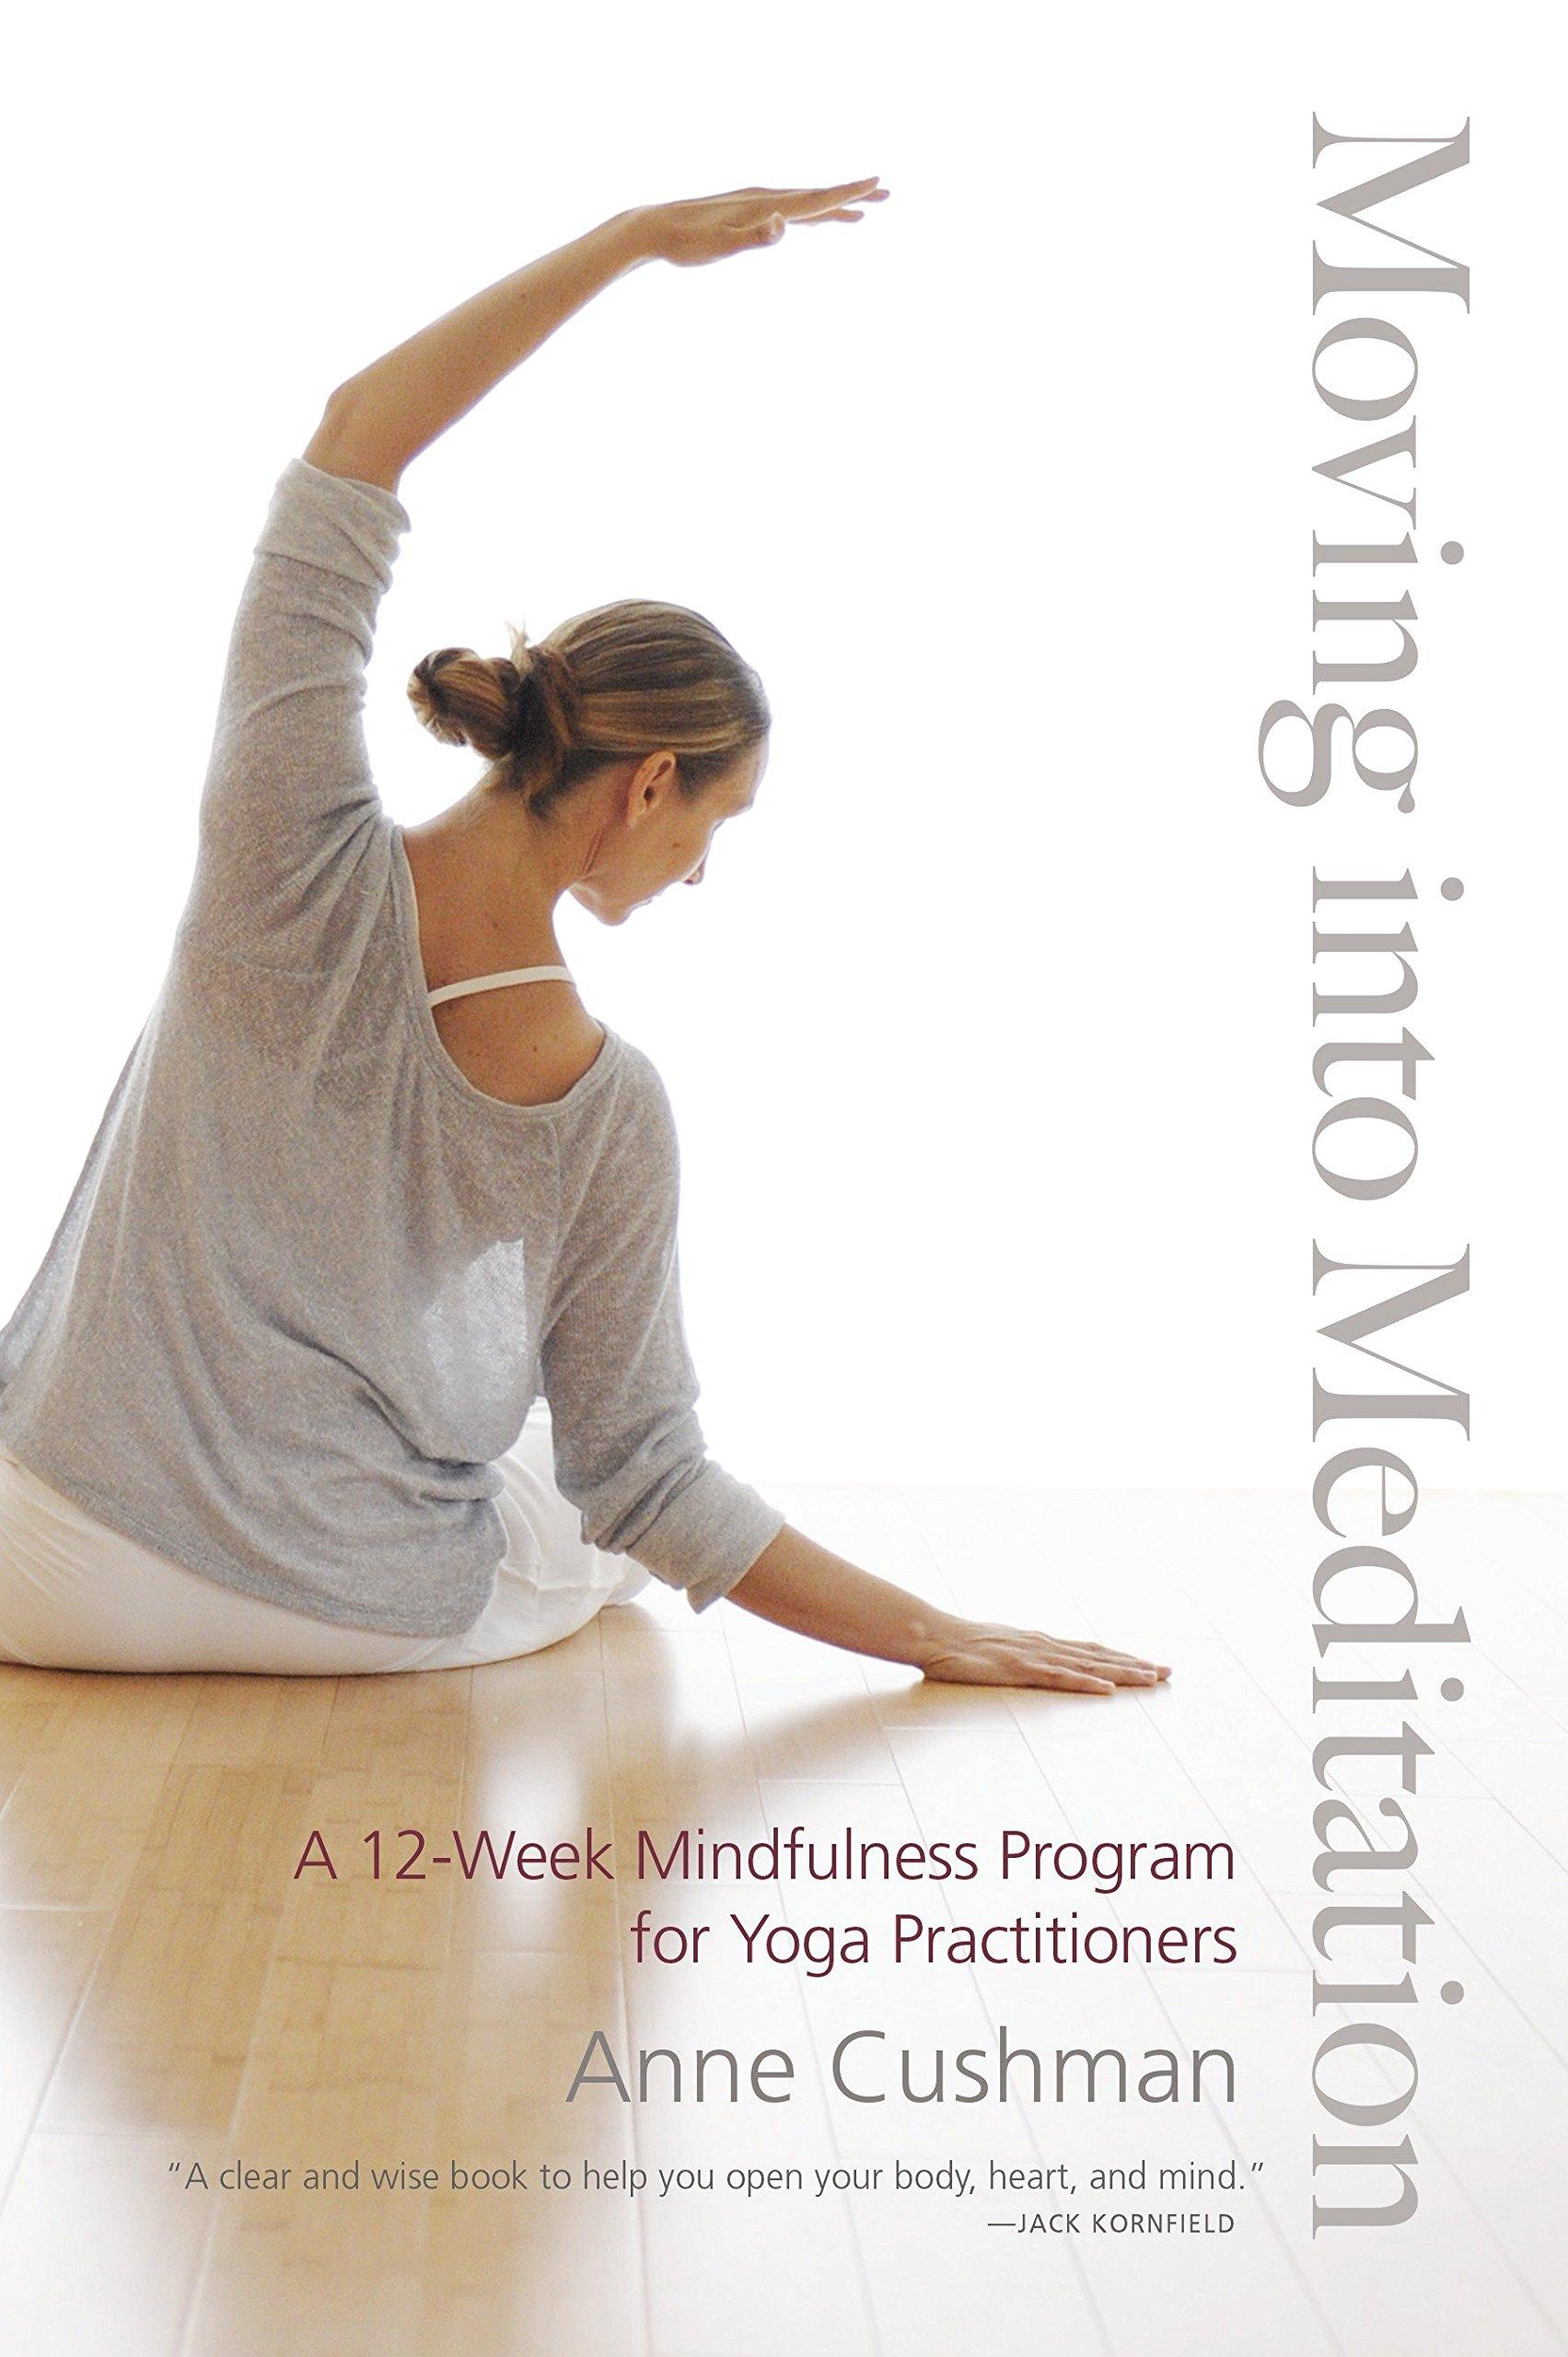 Moving Into Meditation A 12-Week Mindfulness Program for ...